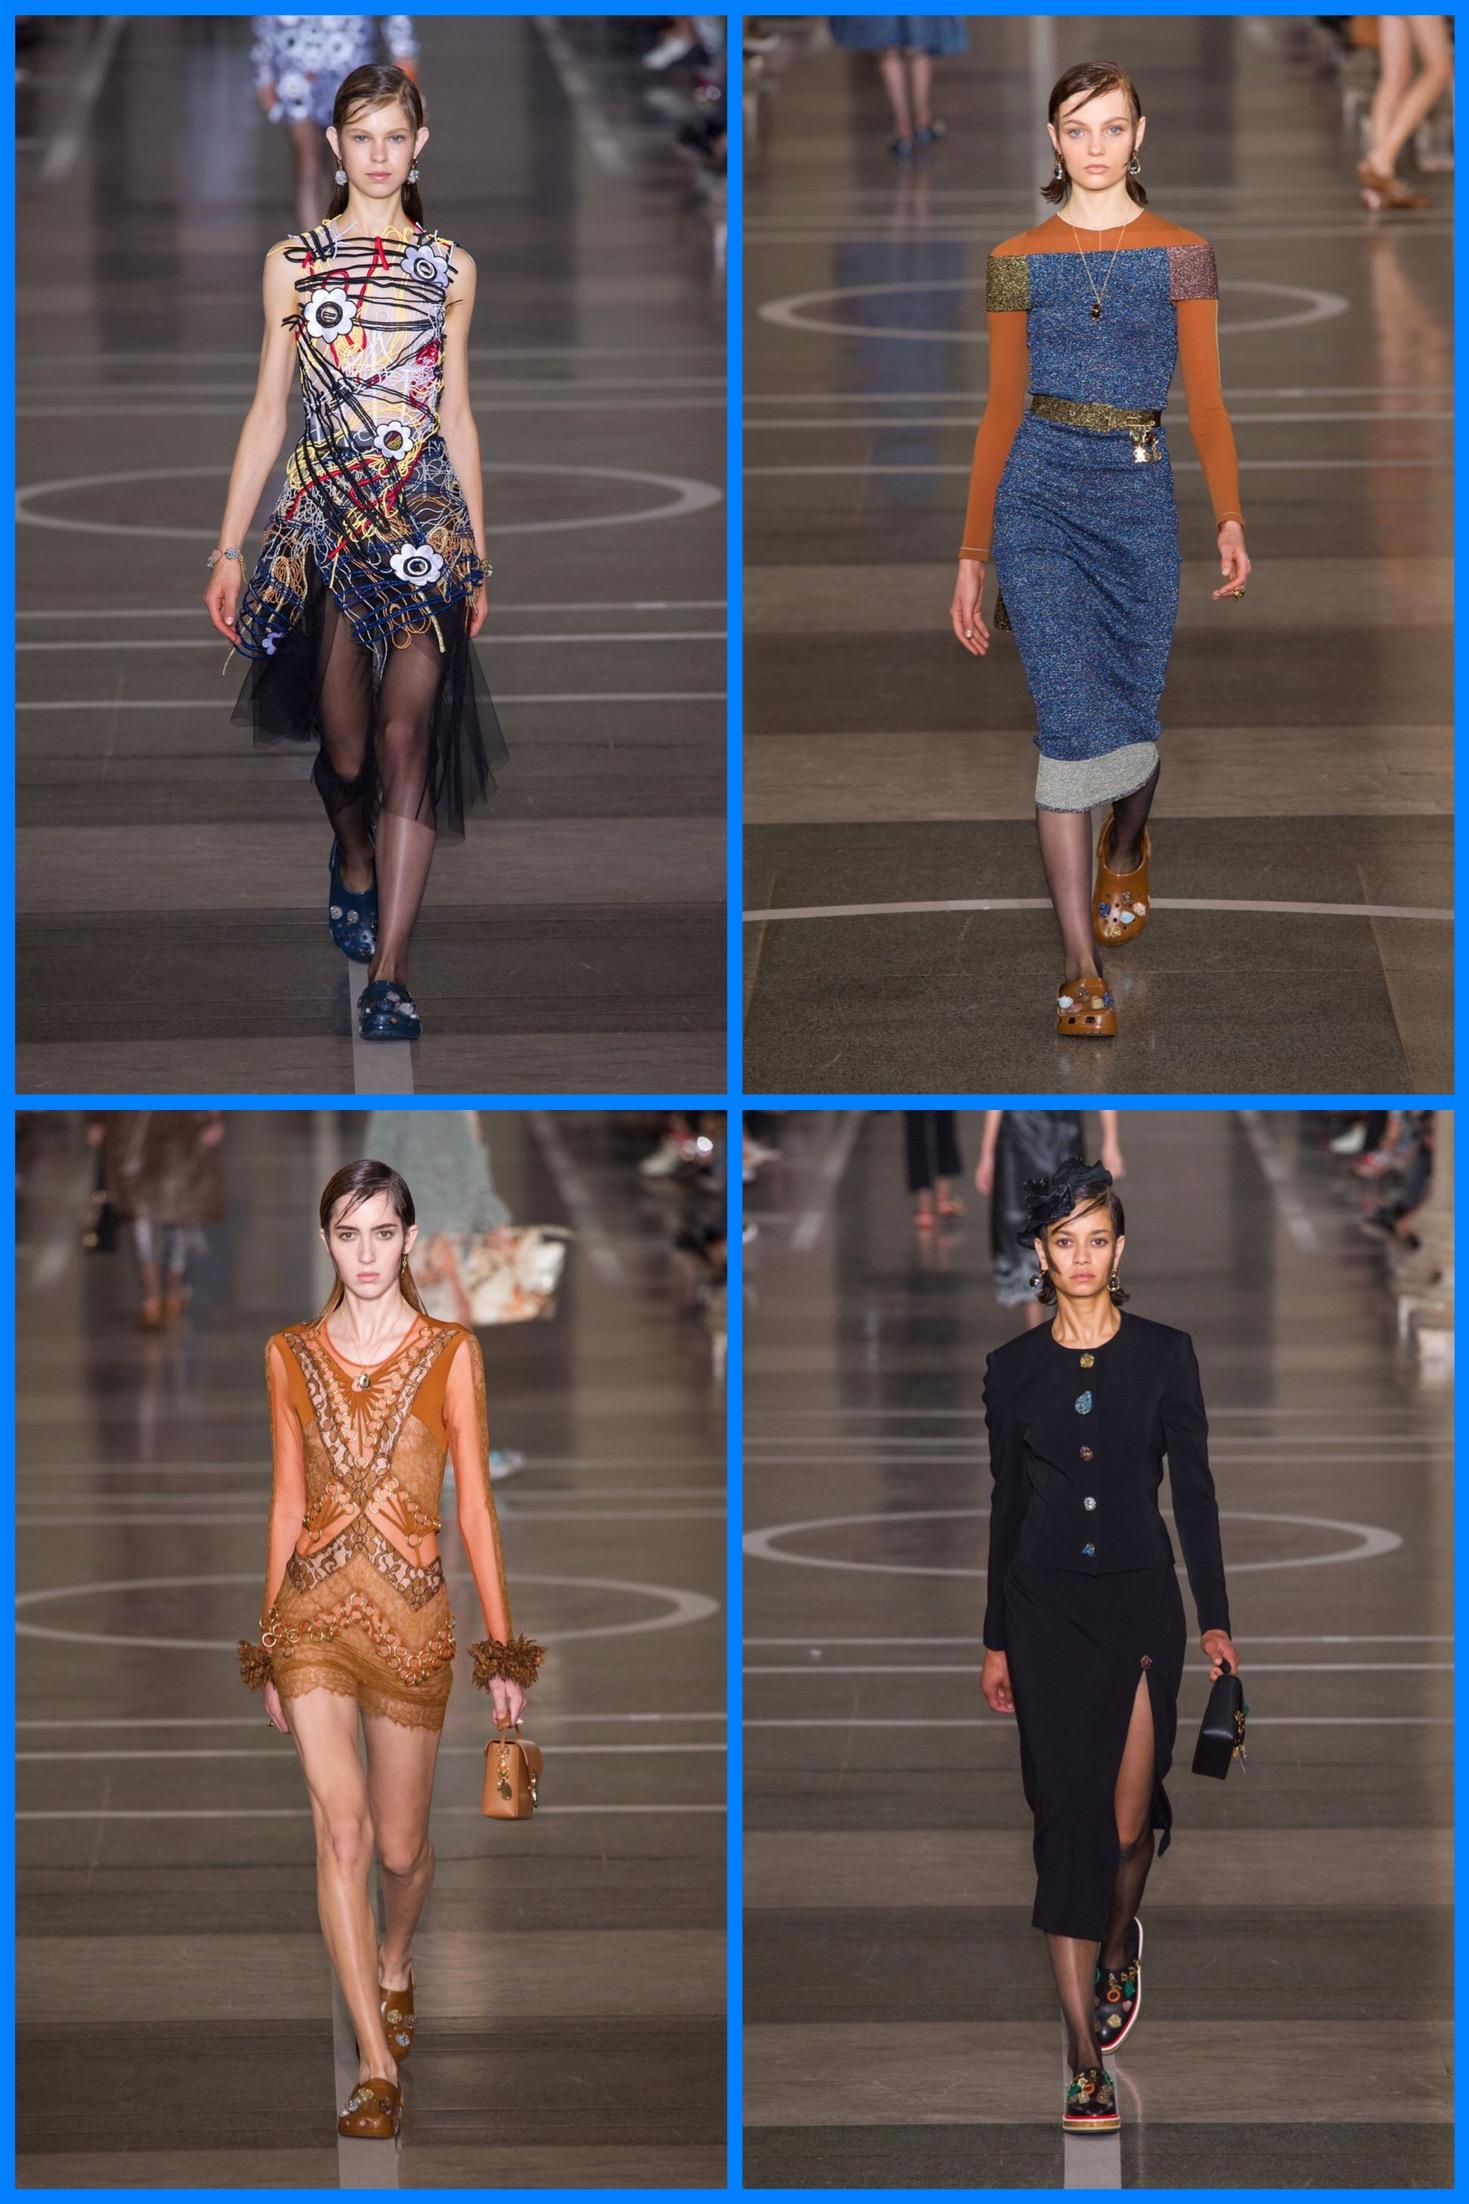 london-fashion-week-pret-a-porter-spring-summer-2017-style-christopher-kane